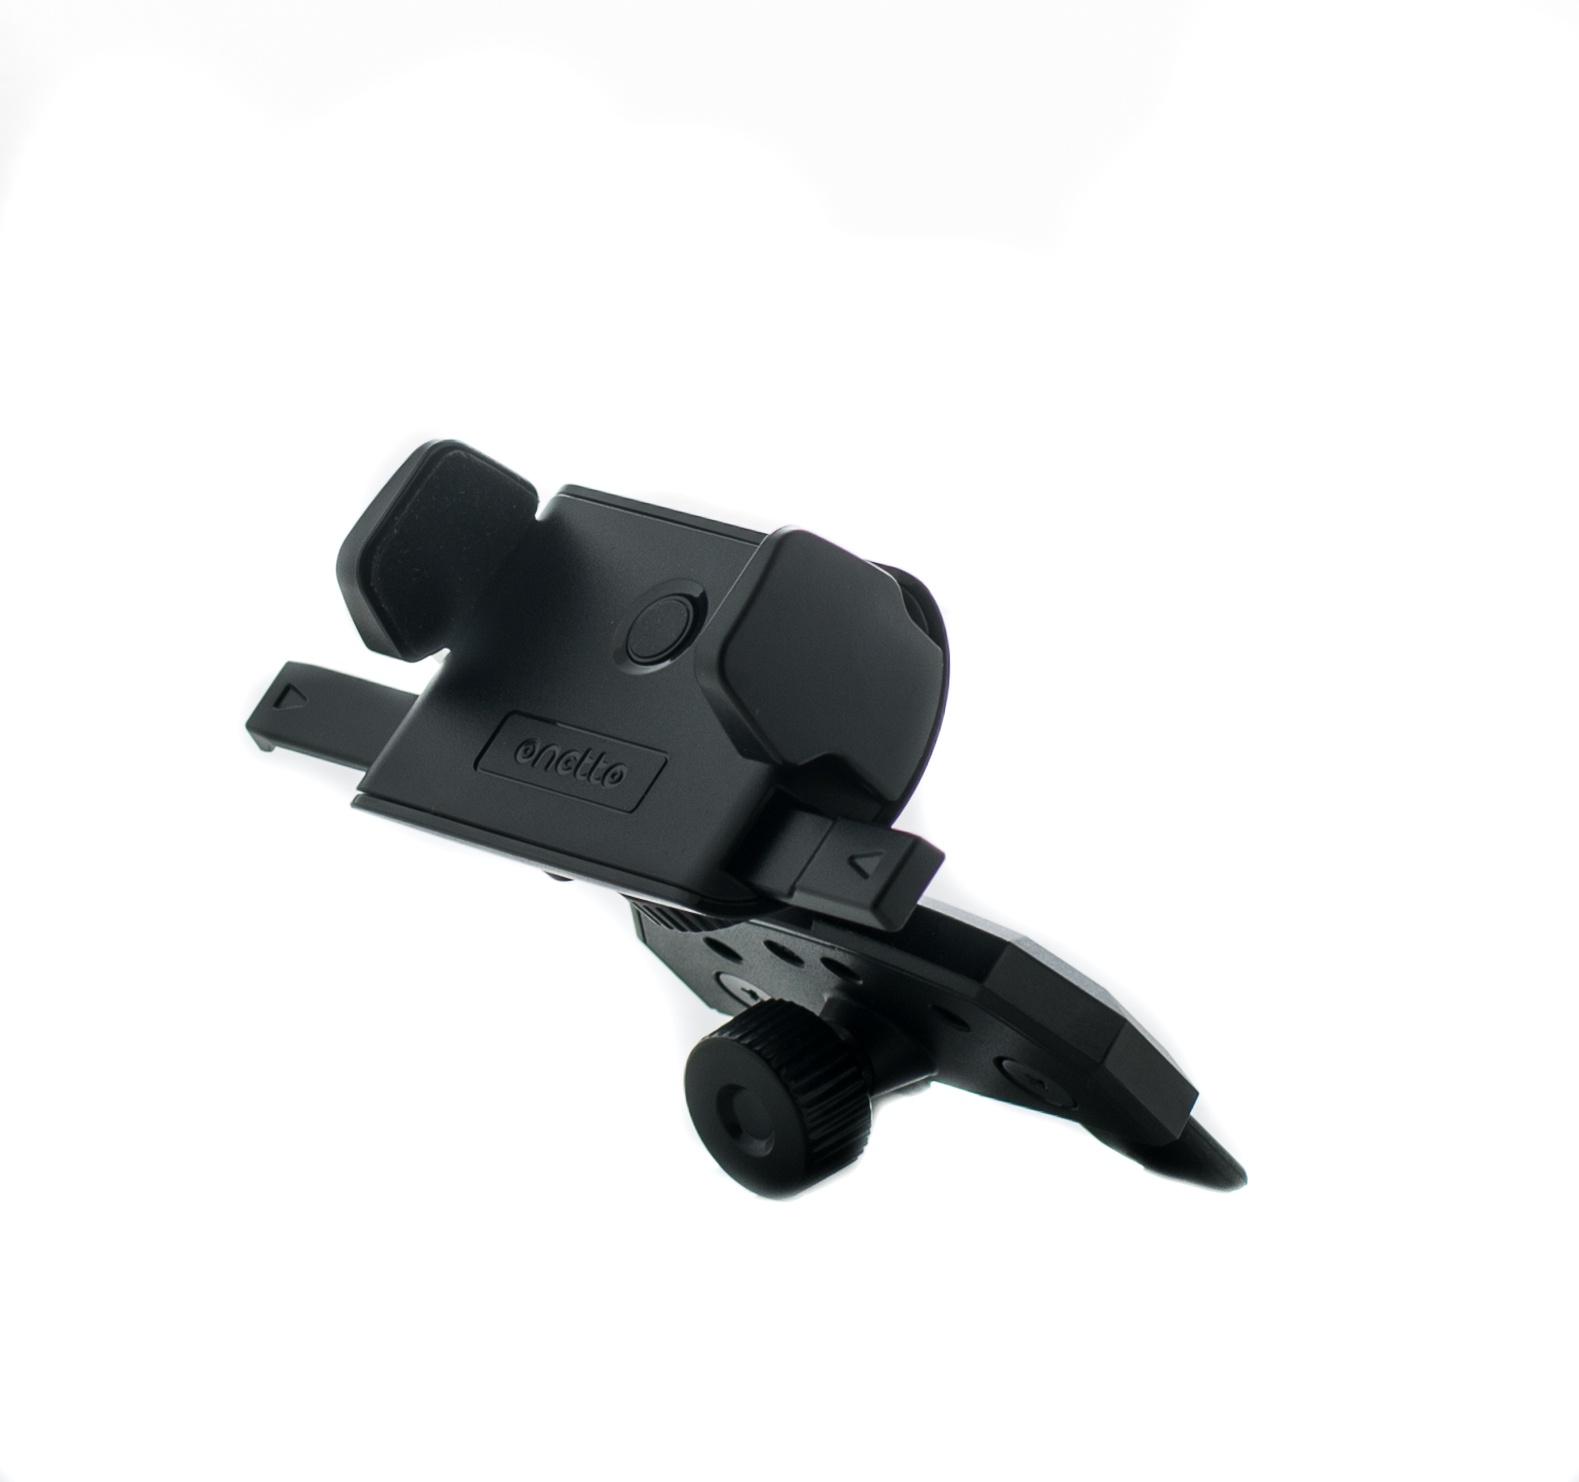 Автомобильный держатель Onetto CD Slot Mount One Touch Mini автомобильный держатель onetto mount easy one touch 2 черный